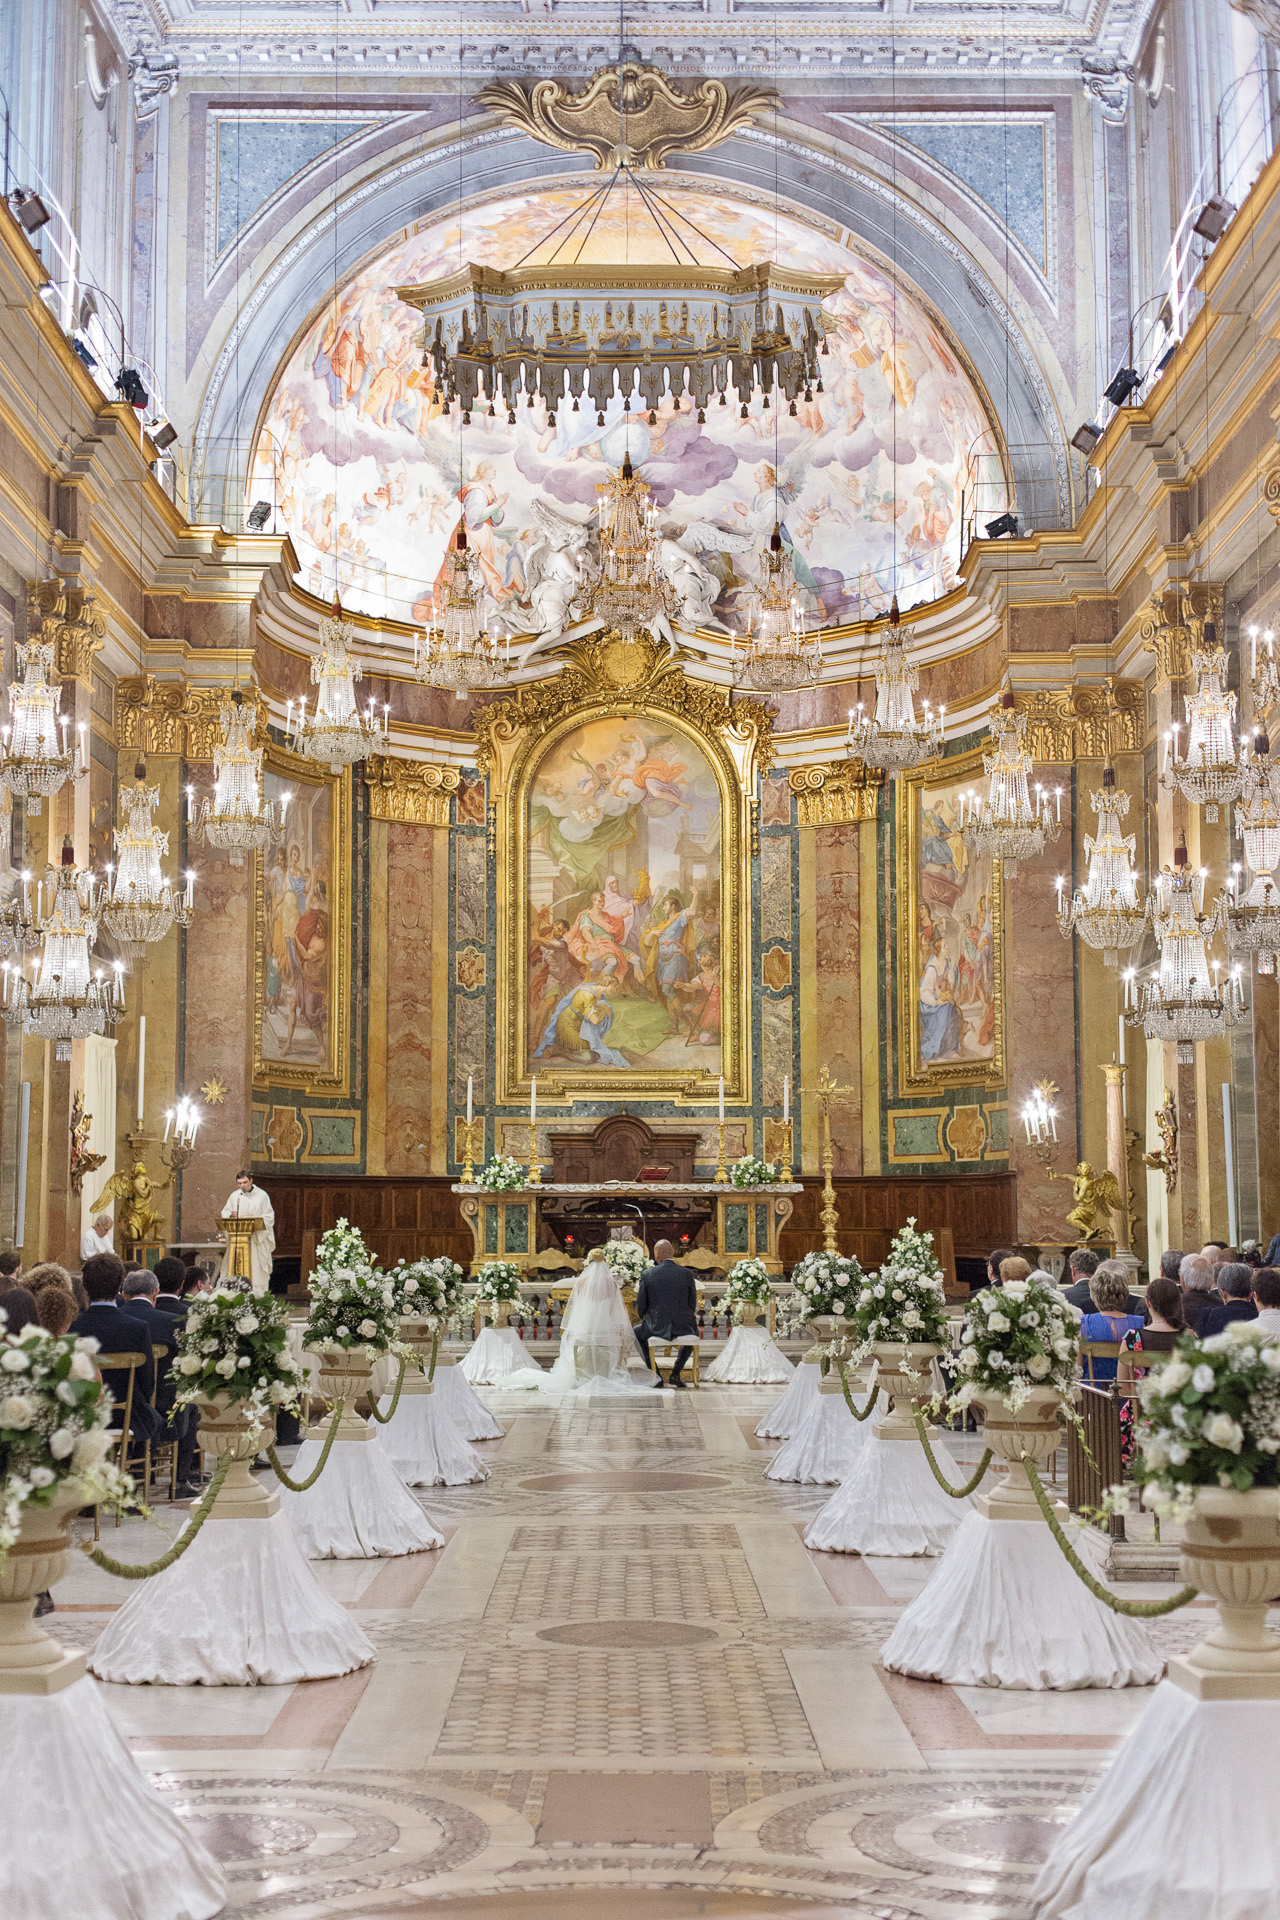 nf-Fotografo-Matrimonio-Roma-Navata-Chiesa-dei-Lampadari